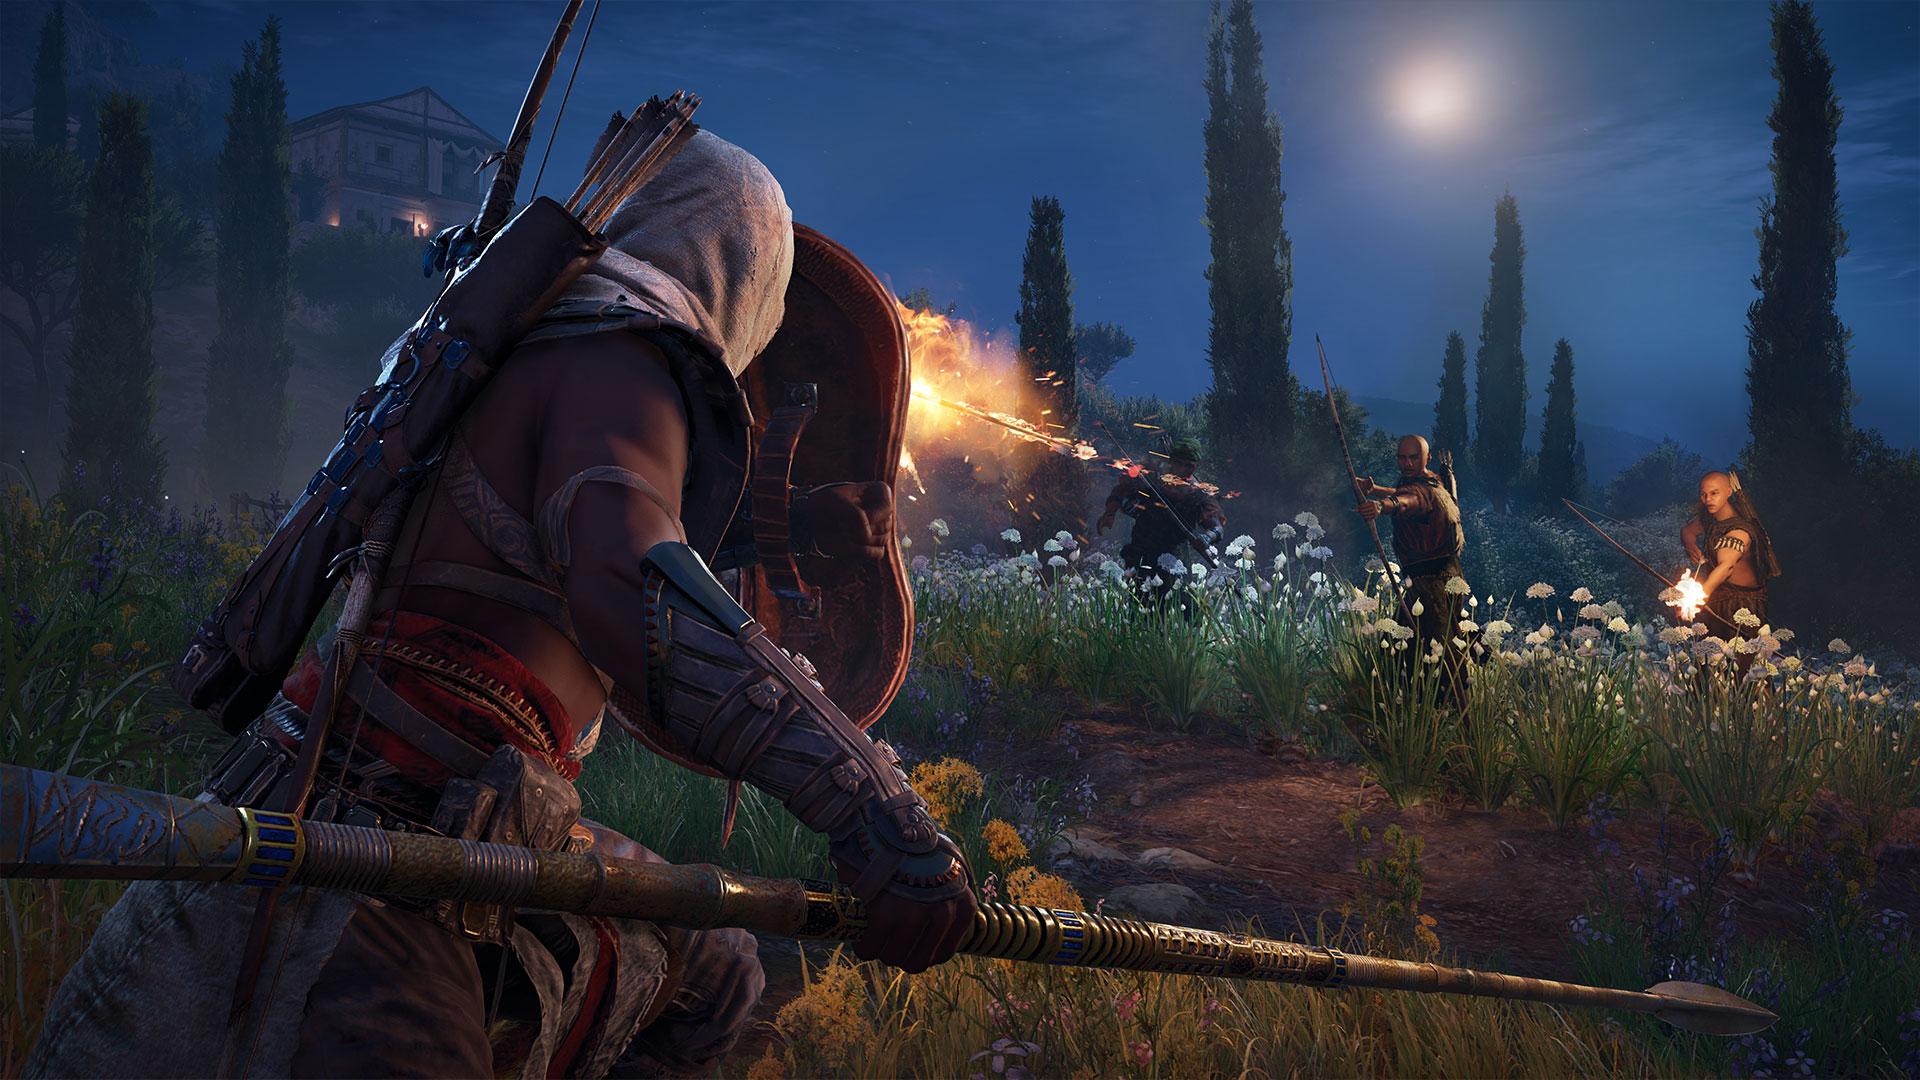 Assassin's Creed unity screen